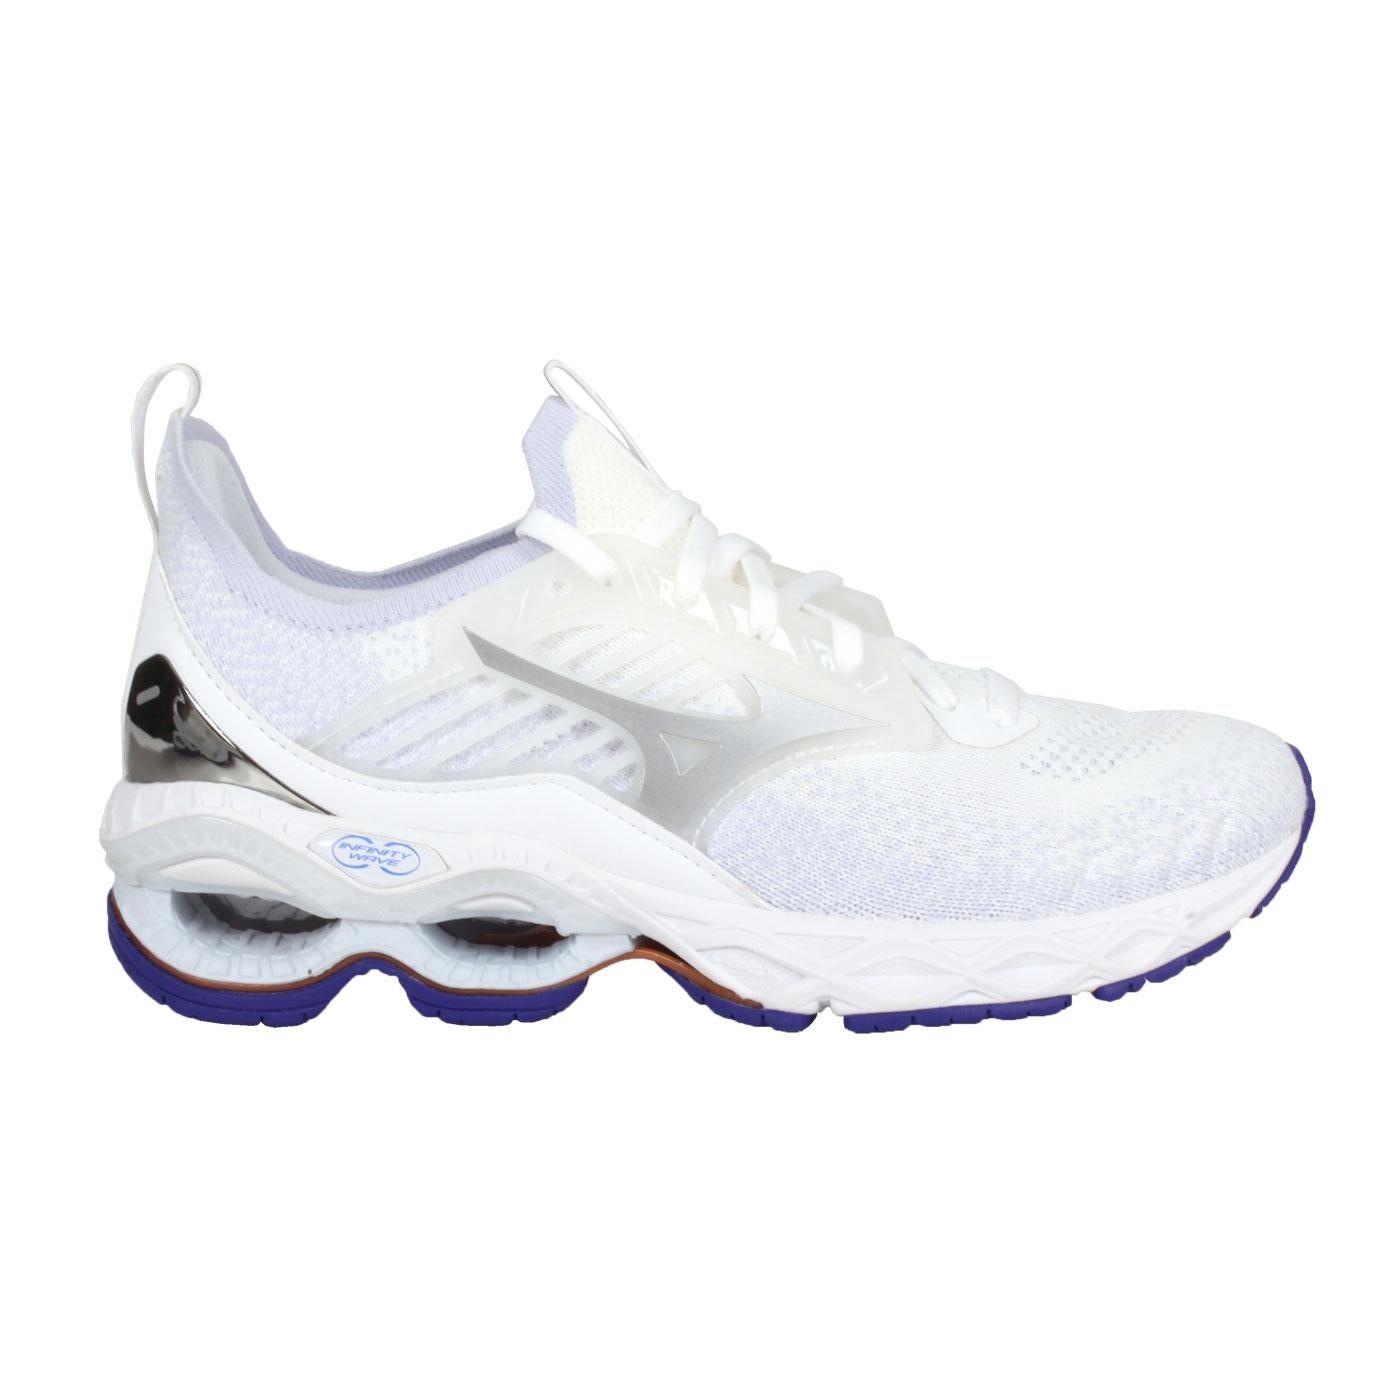 MIZUNO 女款慢跑鞋  @WAVE CREATION 22 WAVEKNIT@J1GD213367 - 白紫銀